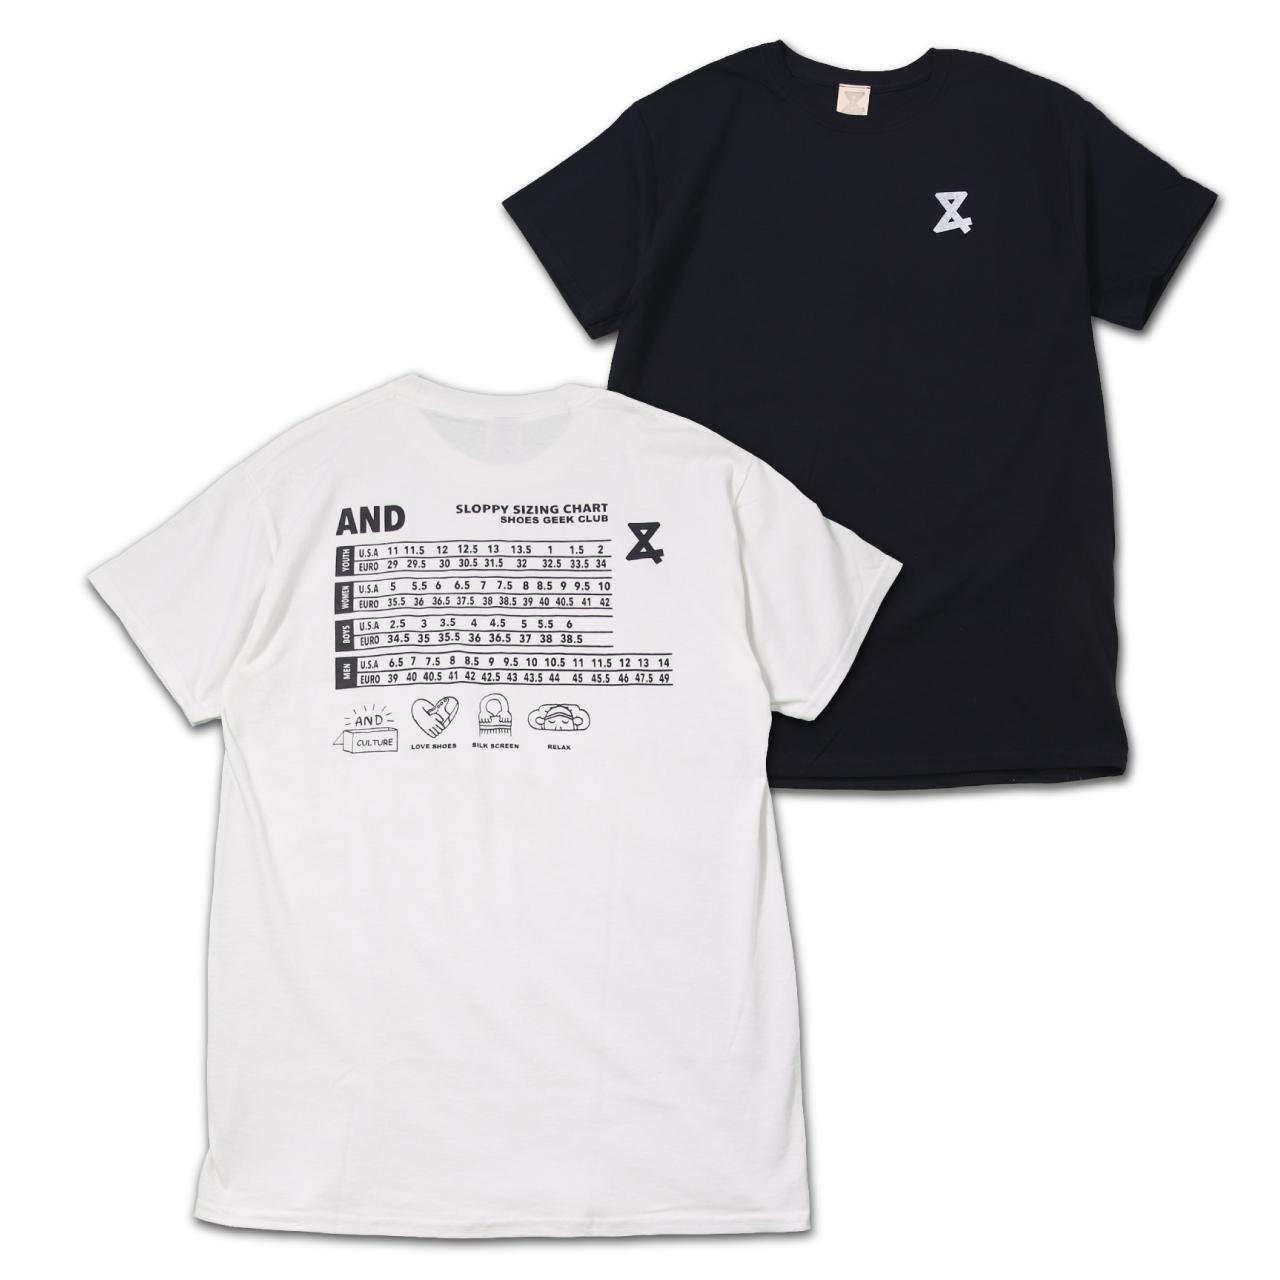 SIZE CHART Tshirts